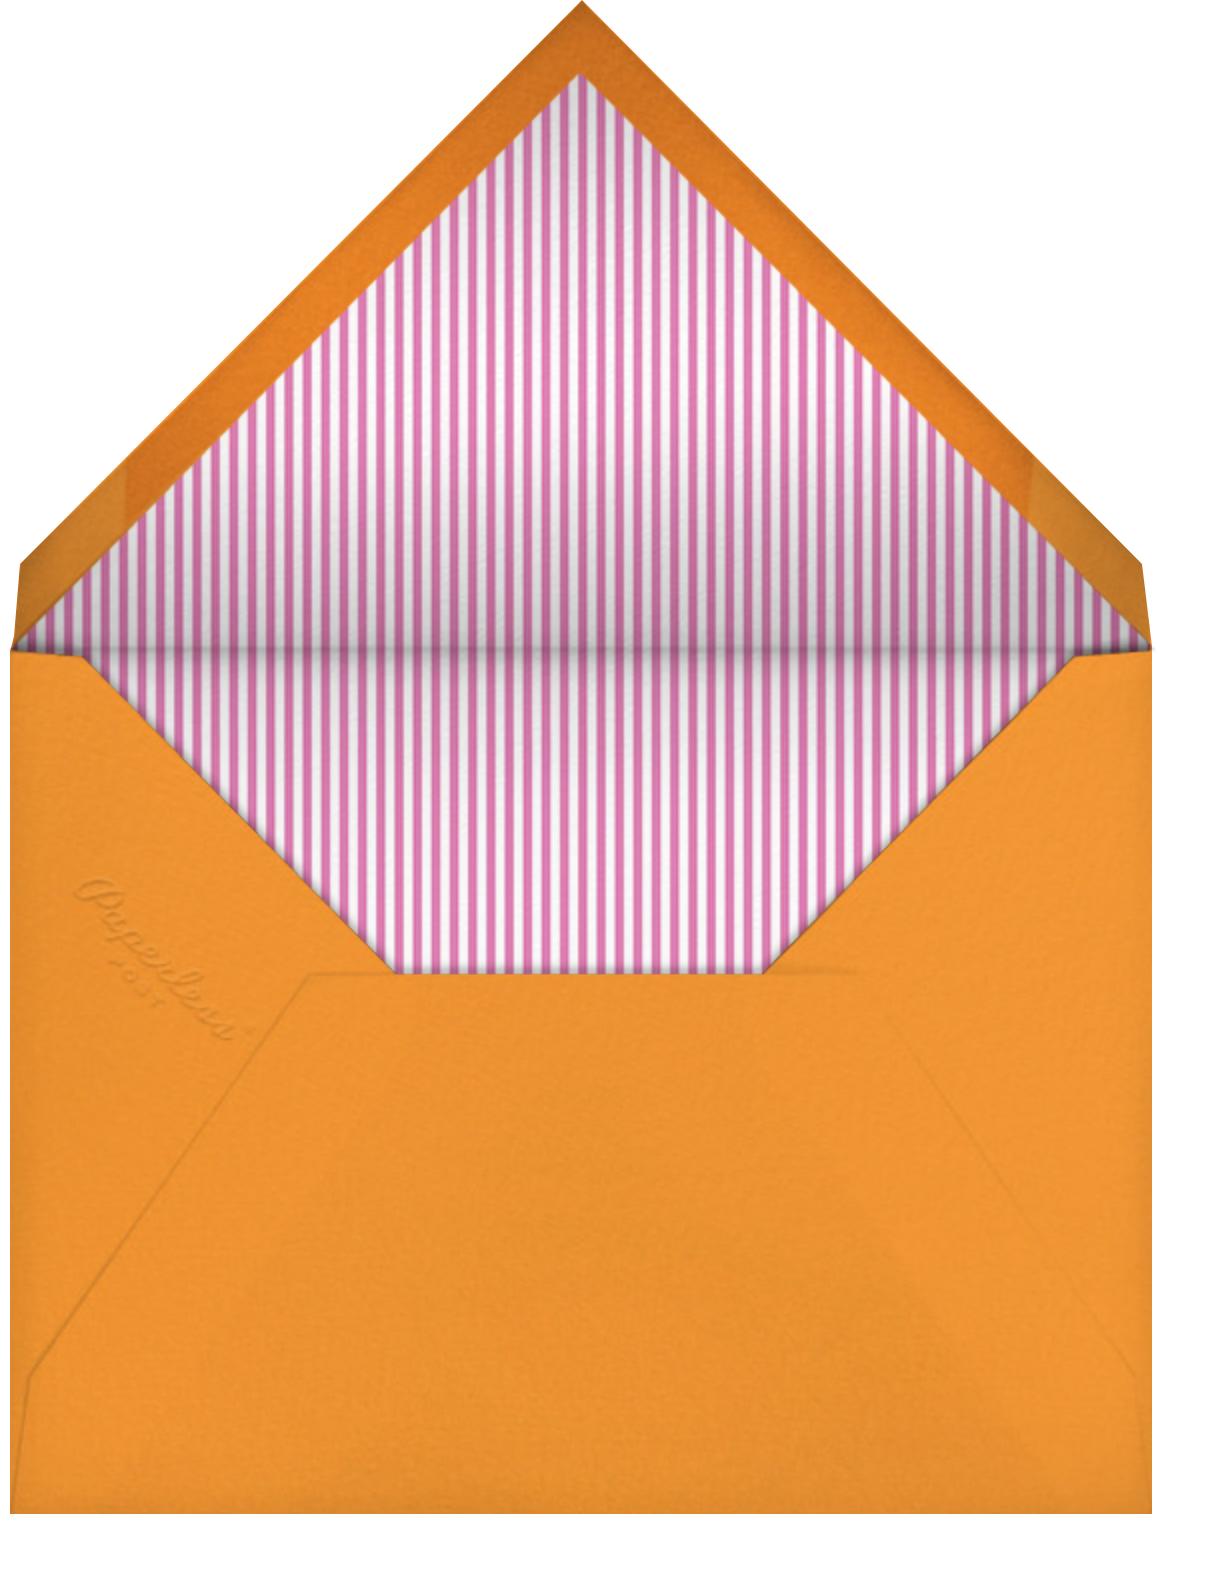 Circus Bonanza - Blossom - Little Cube - 1st birthday - envelope back